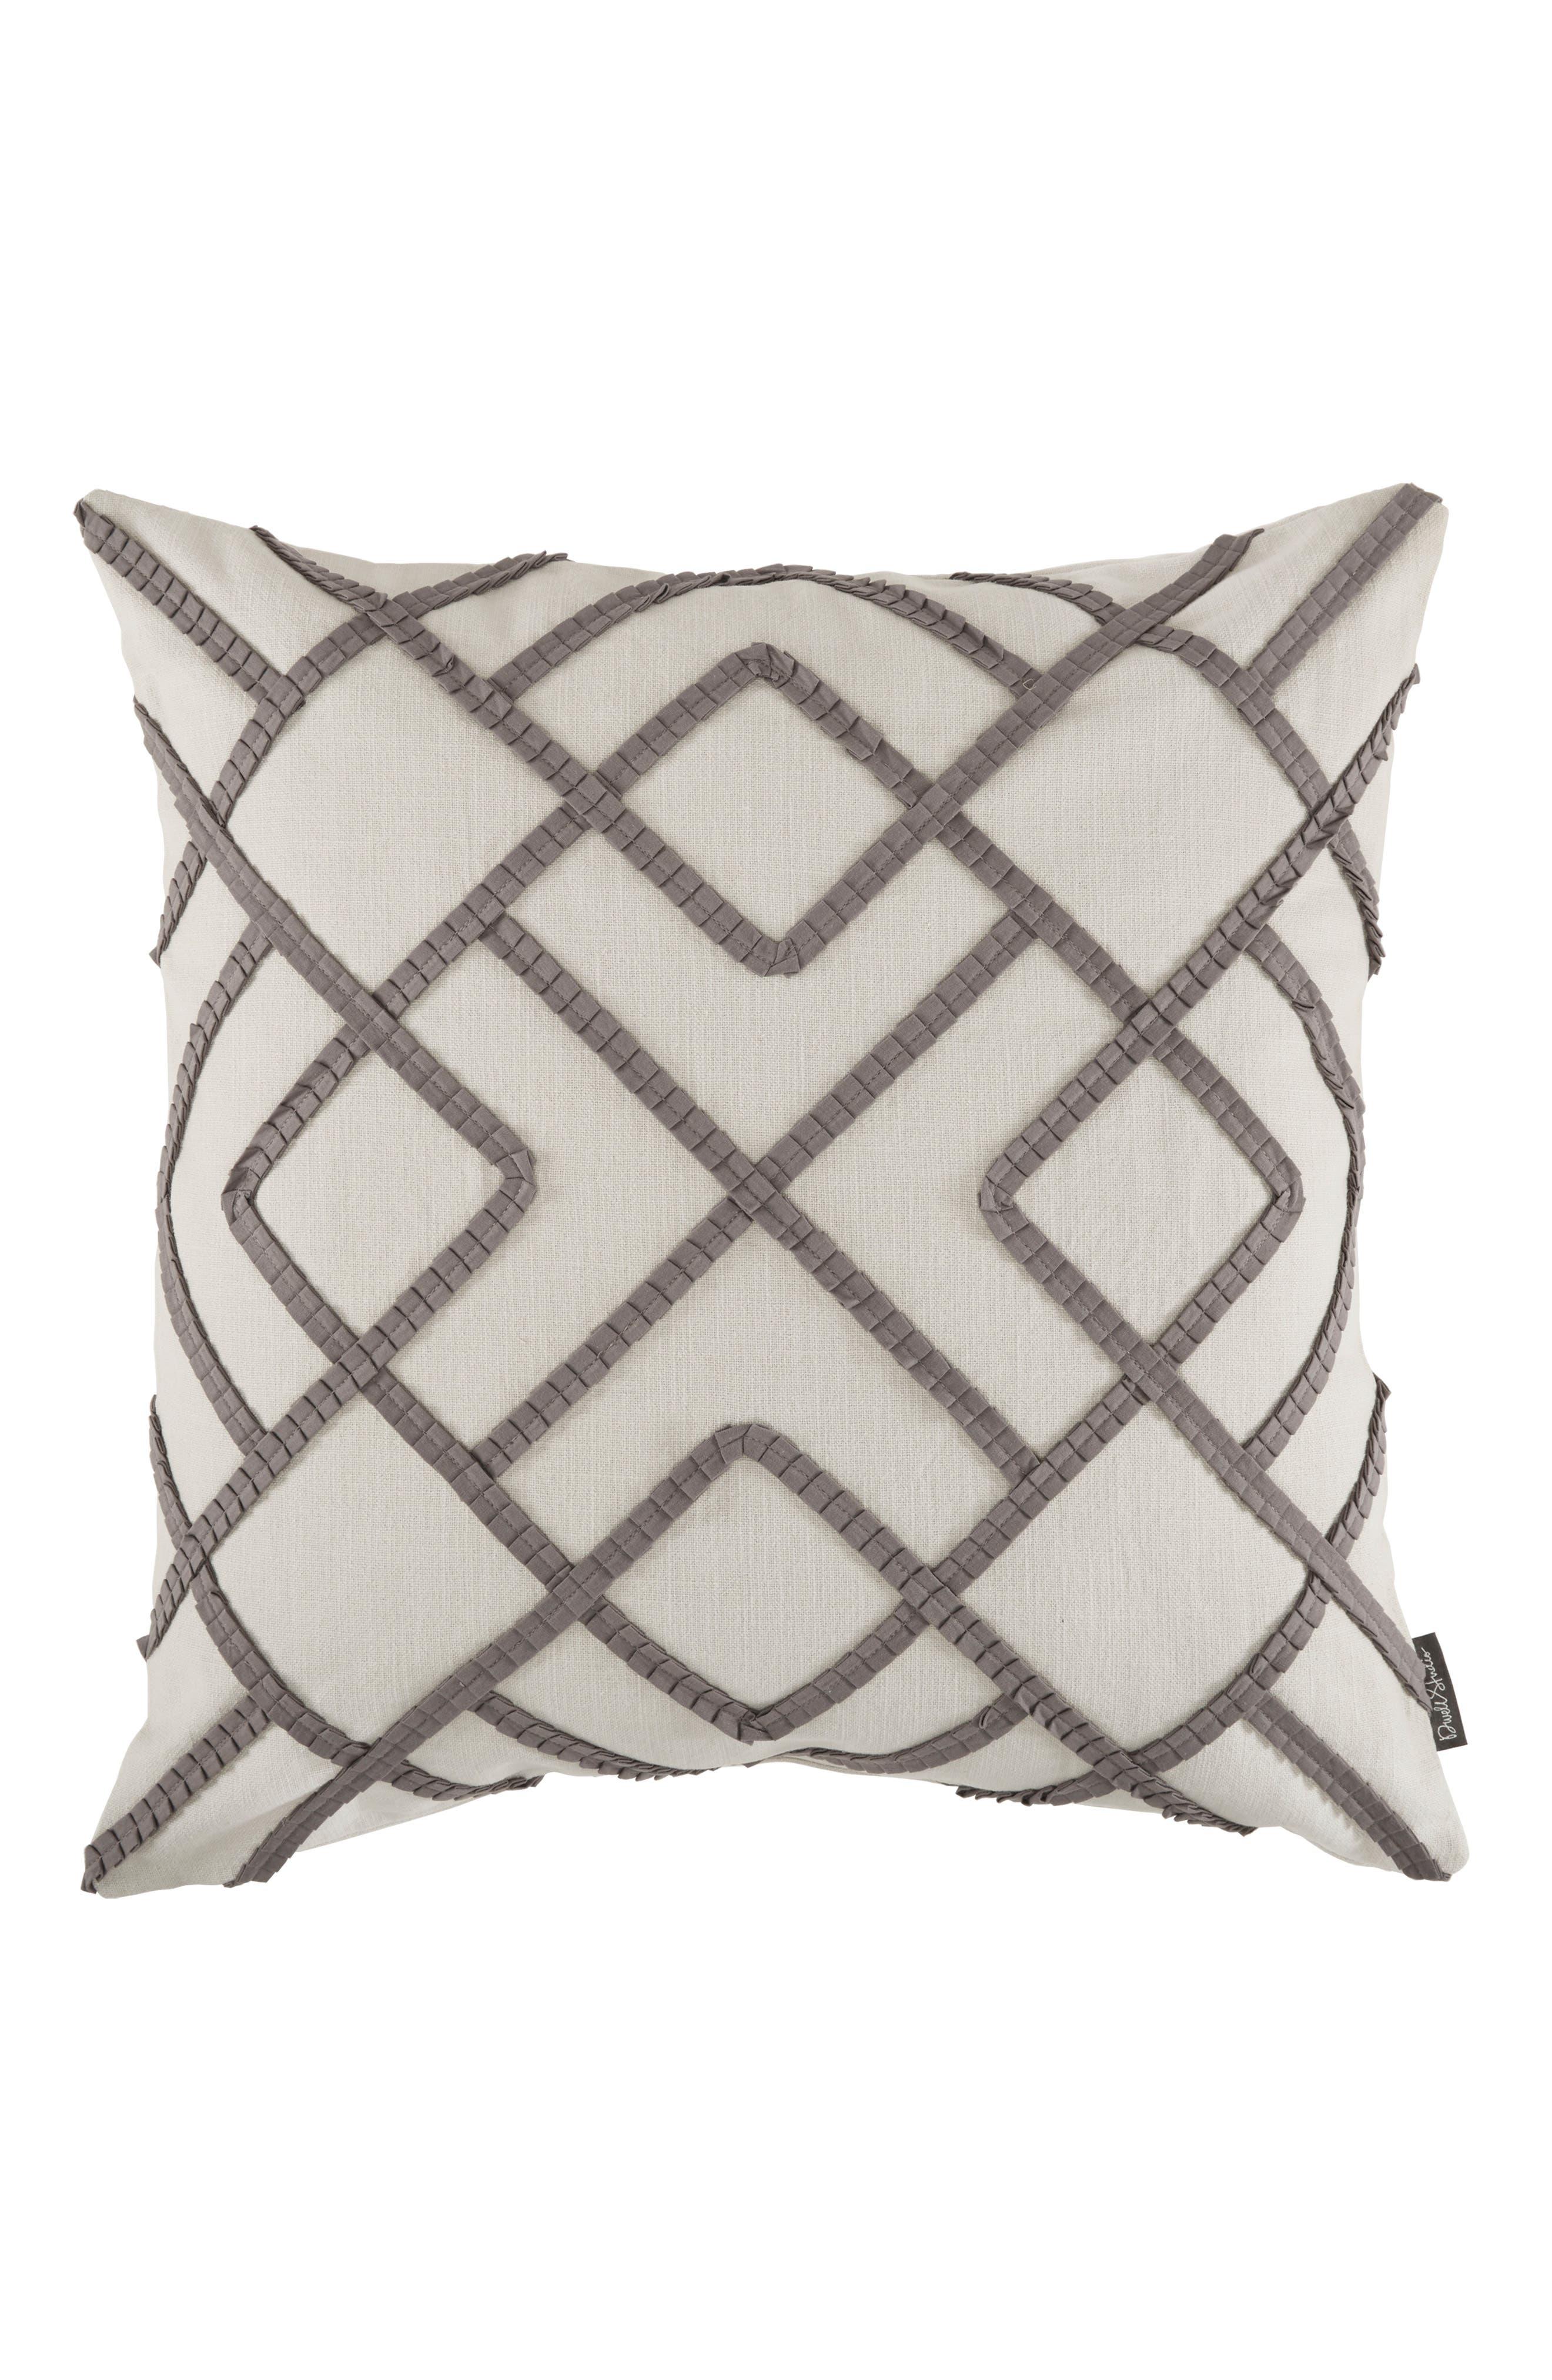 Alternate Image 1 Selected - DwellStudio Windsor Accent Pillow